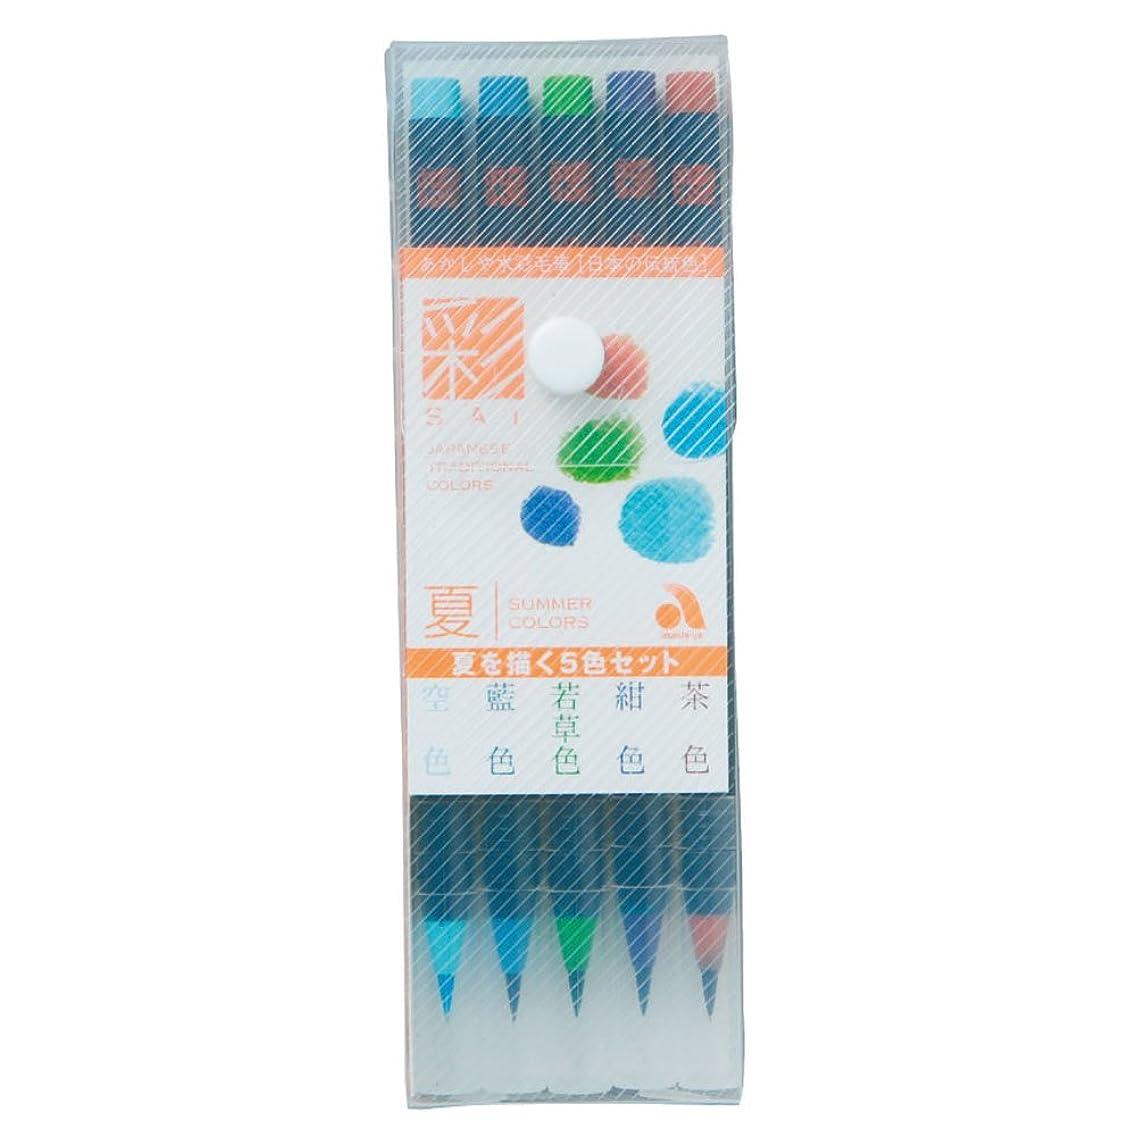 Akashiya Fude Brush Pen Sai, 5 Summer Color Set (CA200/5VB)